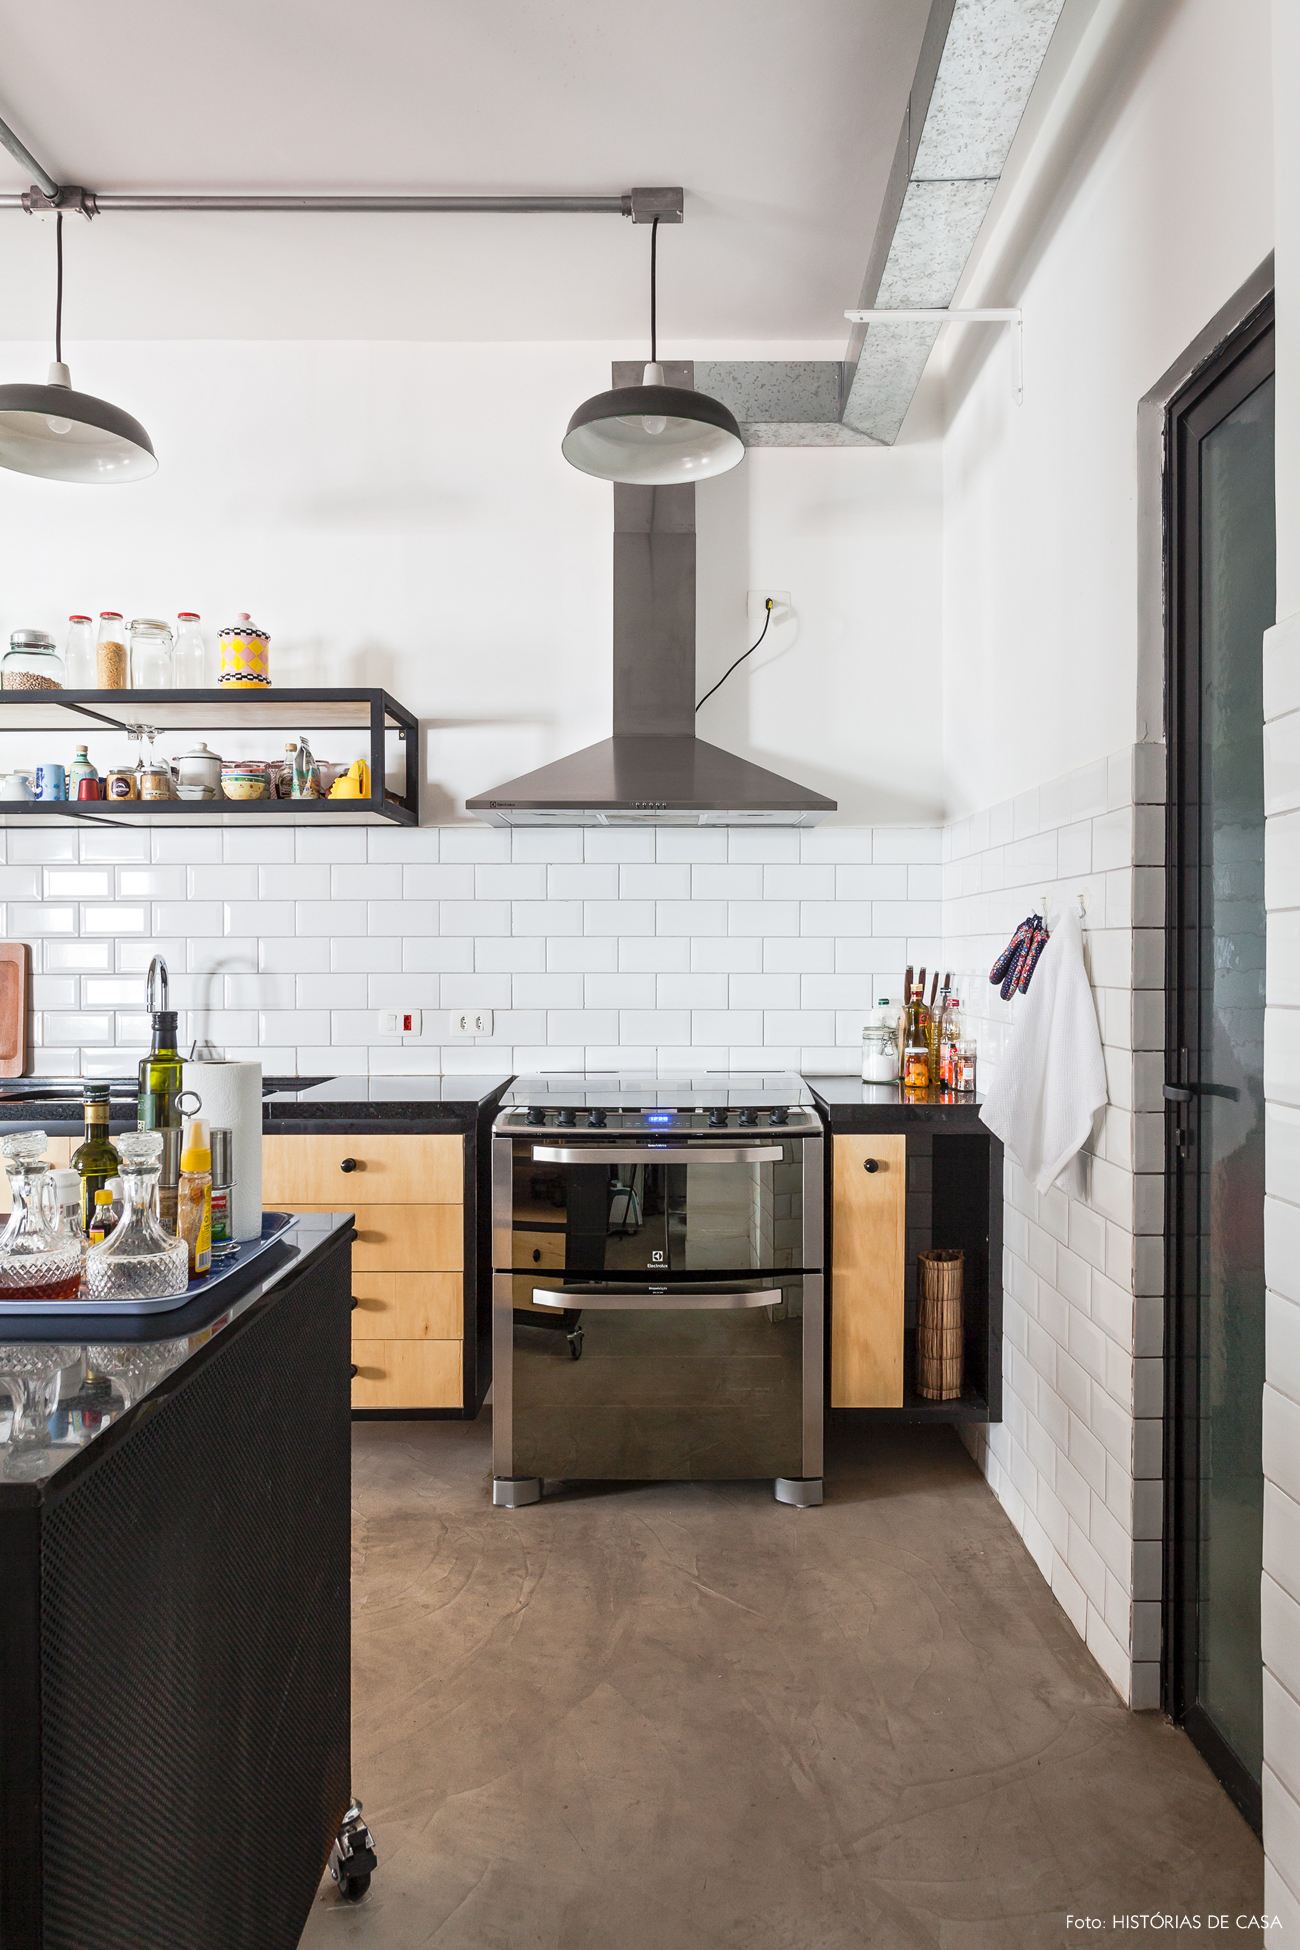 32-decoracao-cozinha-integrada-industrial-subway-tiles